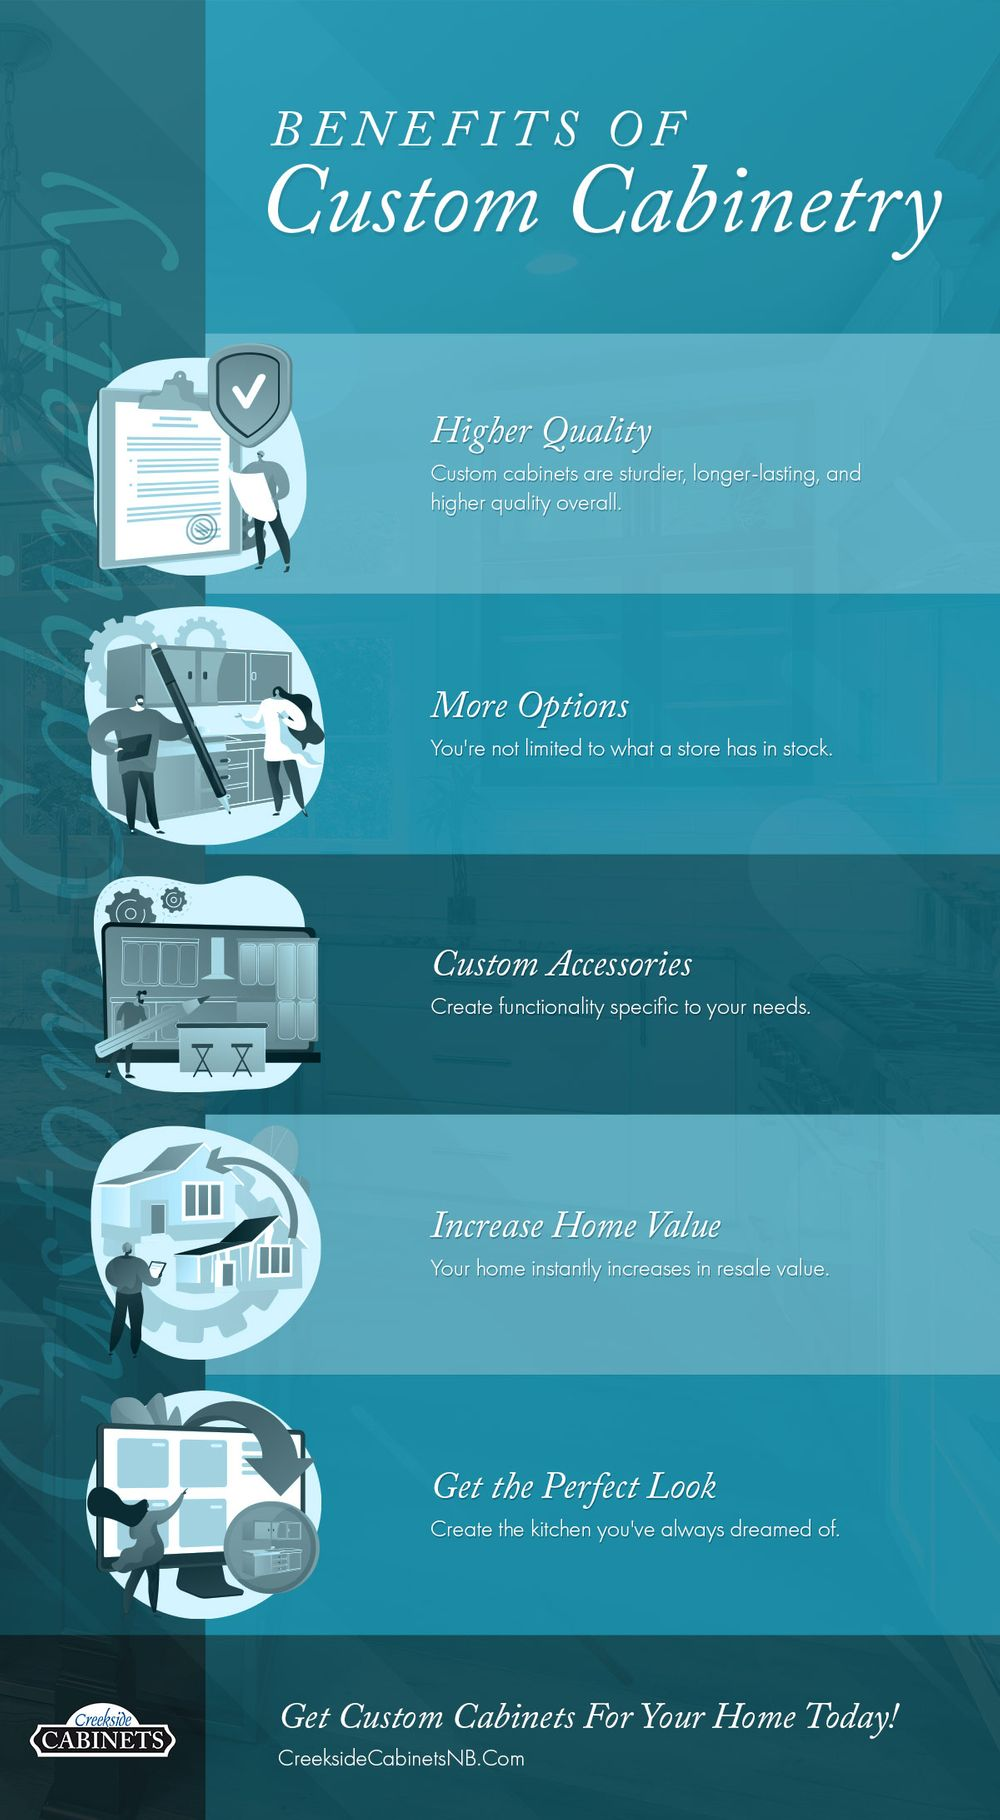 CustomCabinetry_Infographic.jpg